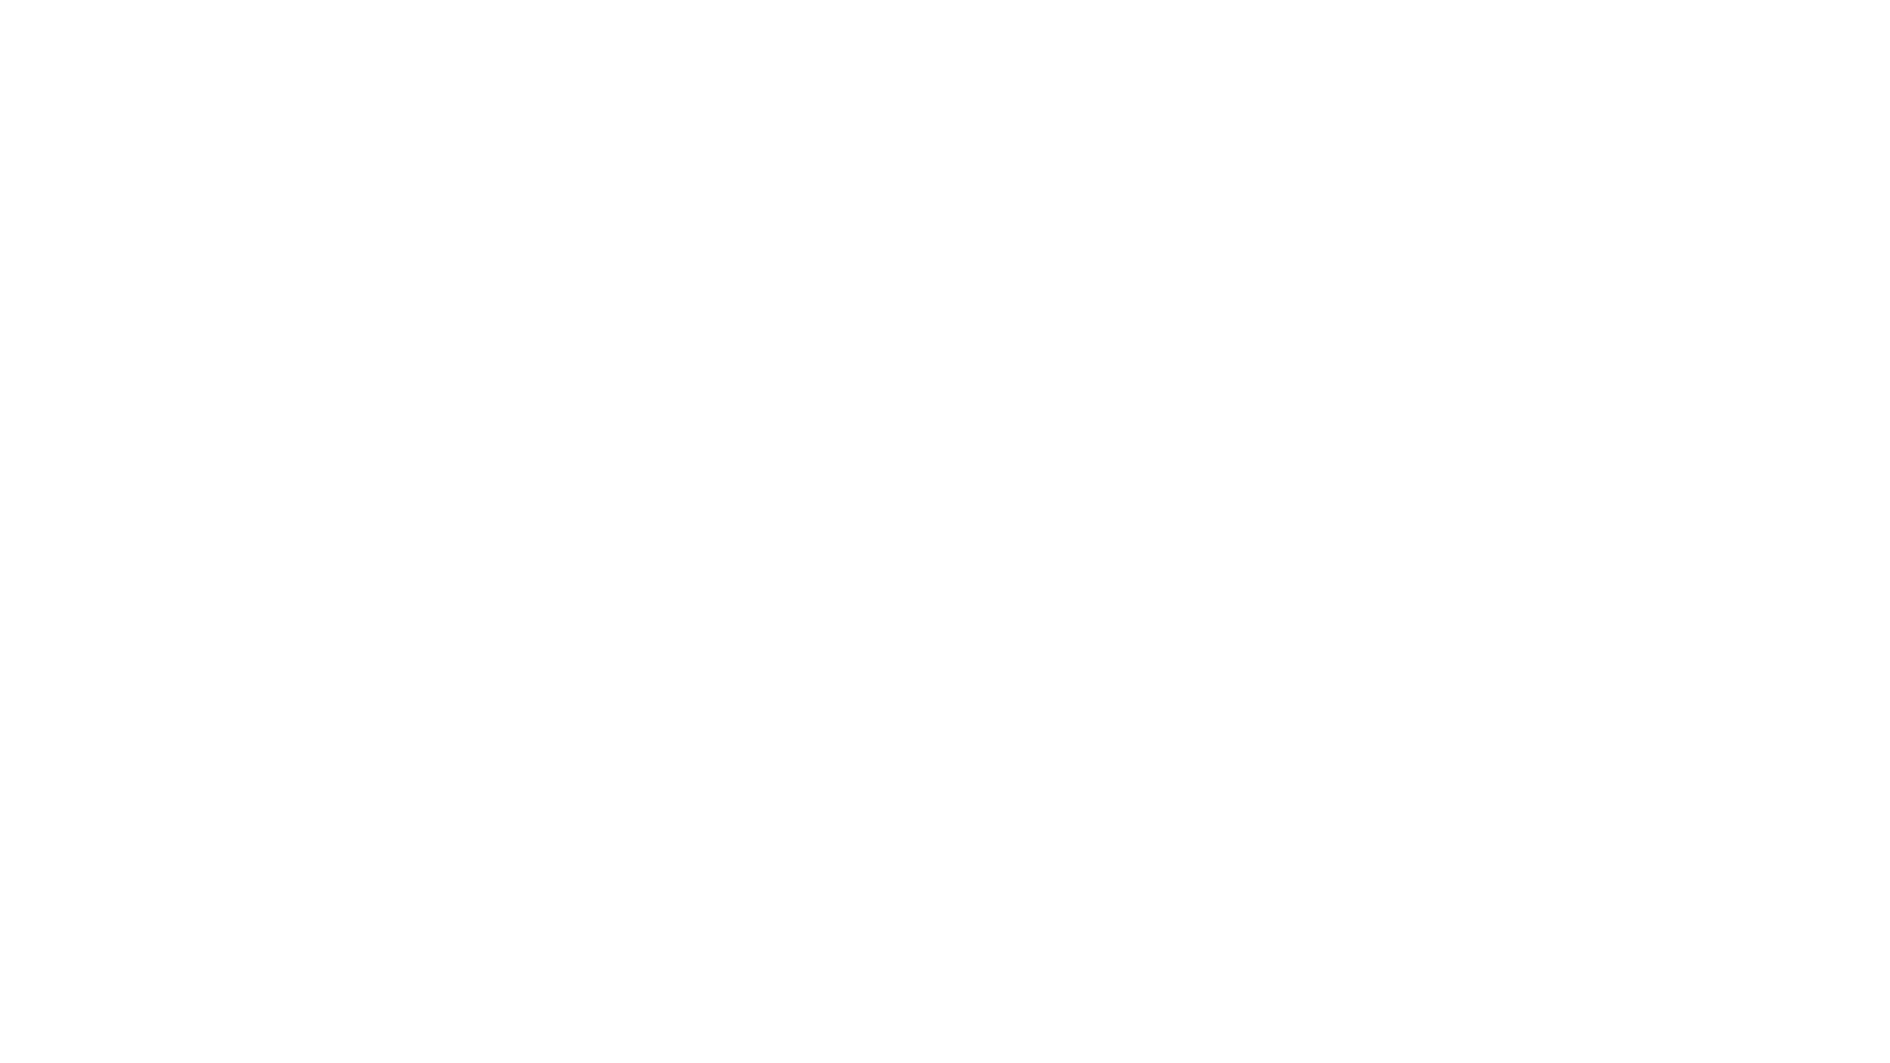 Logo-doc-04.png